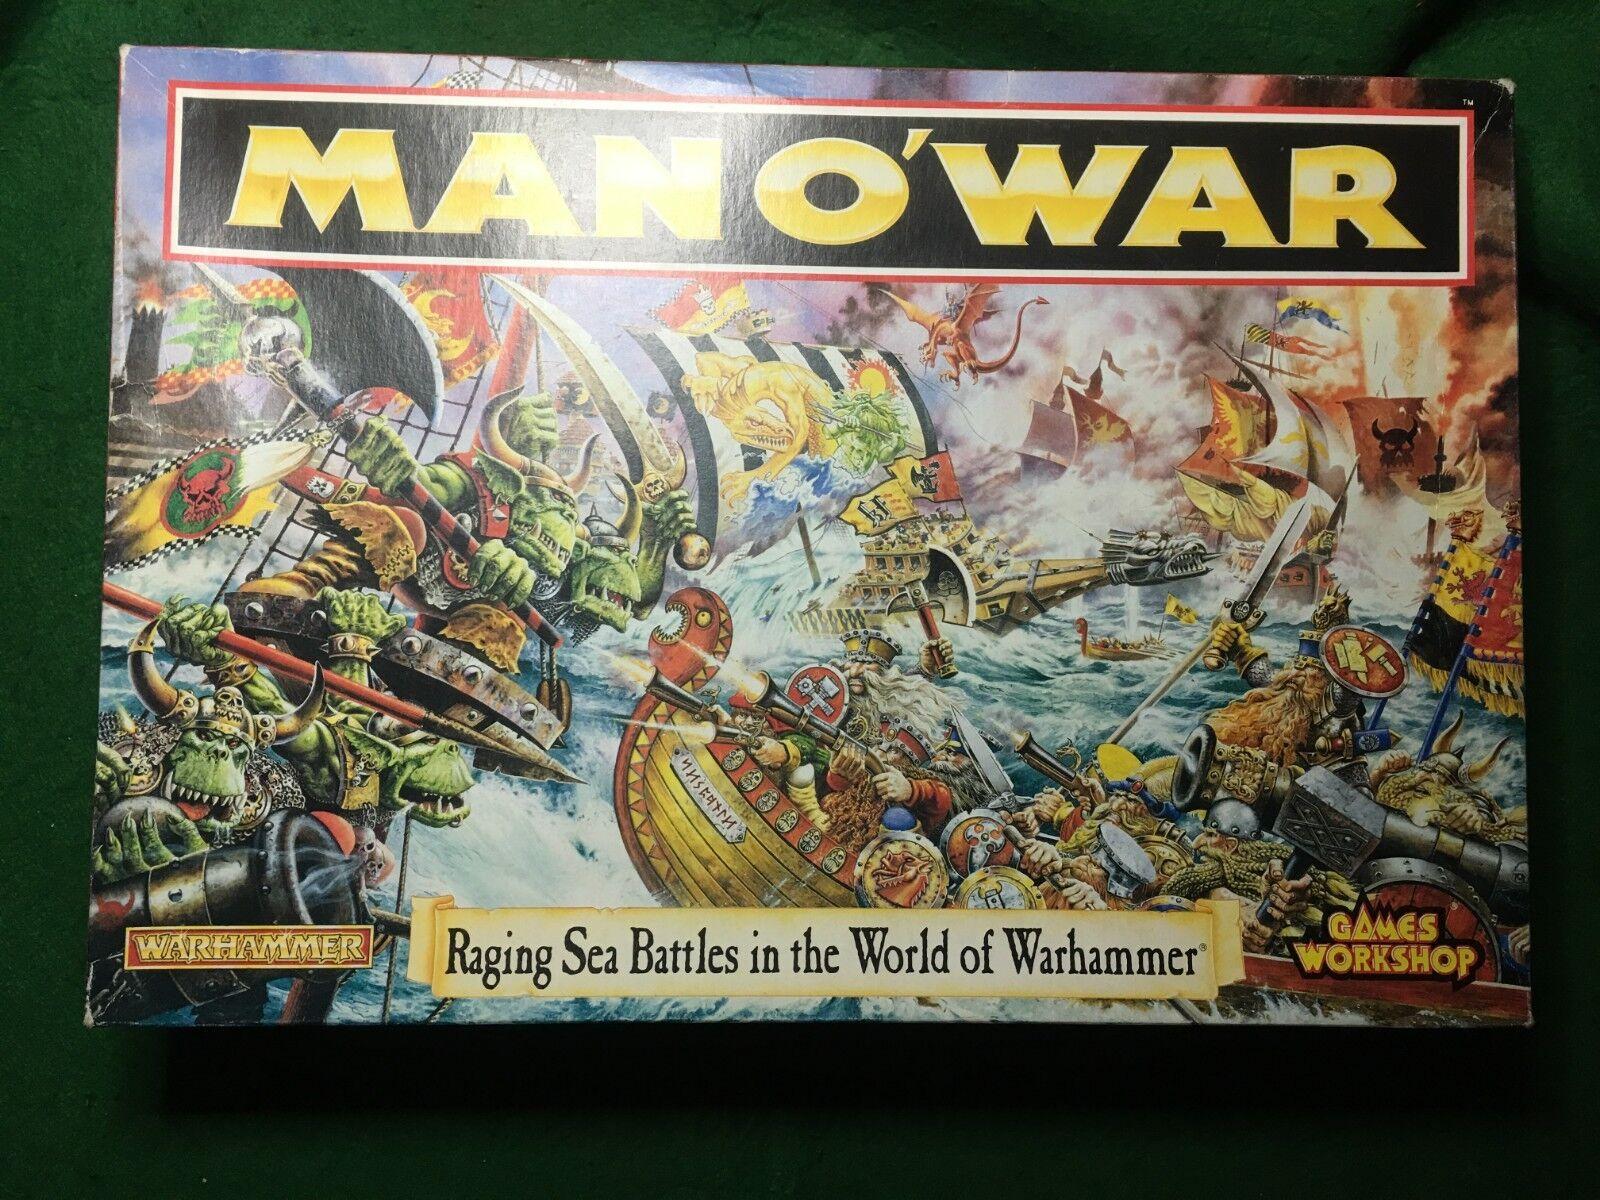 JUEGO MAN O'WAR RACING SEA BATTLES IN THE WORLD OF WARHAMMER DE JuegoS WORKSHOP